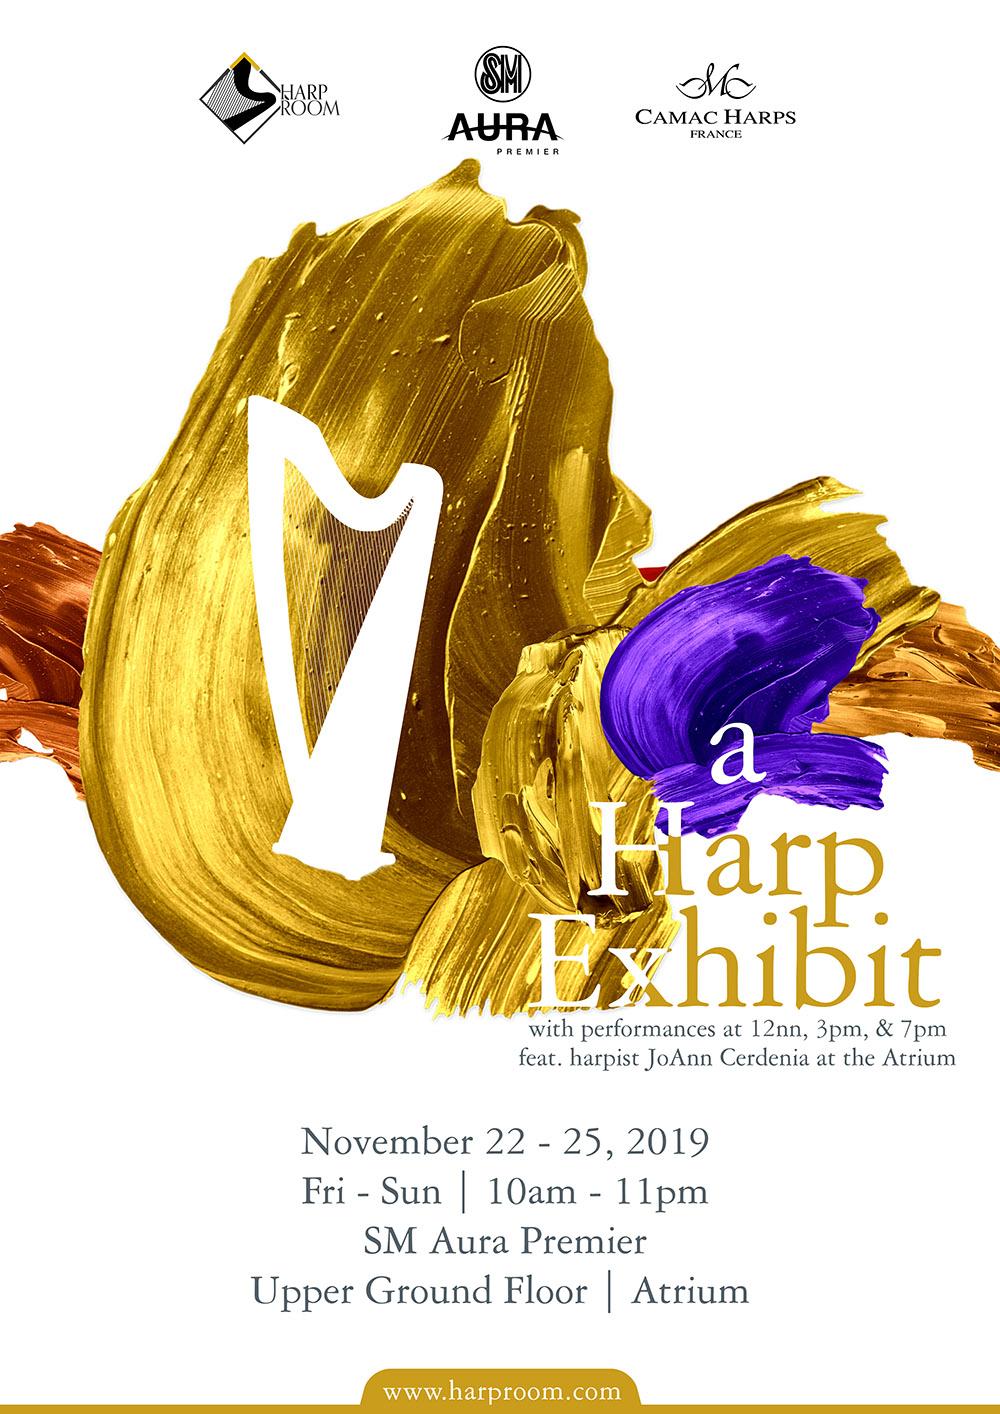 Poster: A harp exhibit